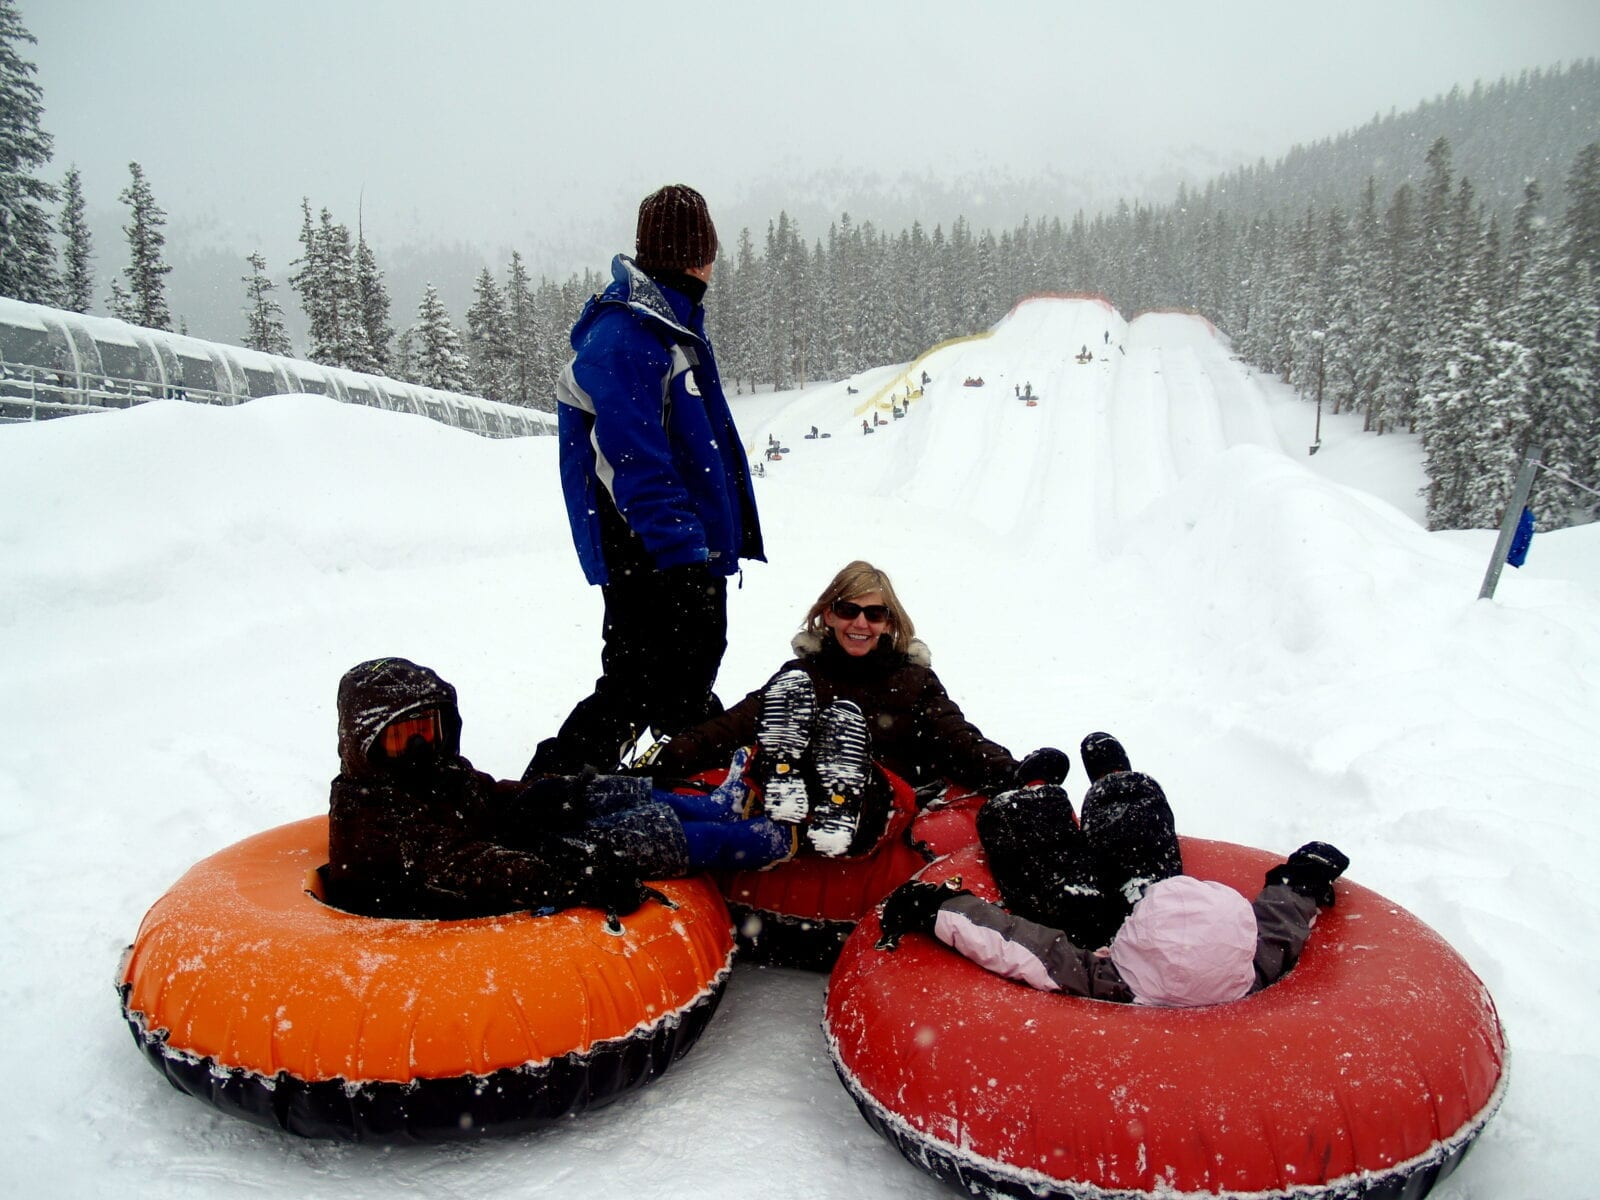 Rahills tubing on Keystone Resort, Colorado